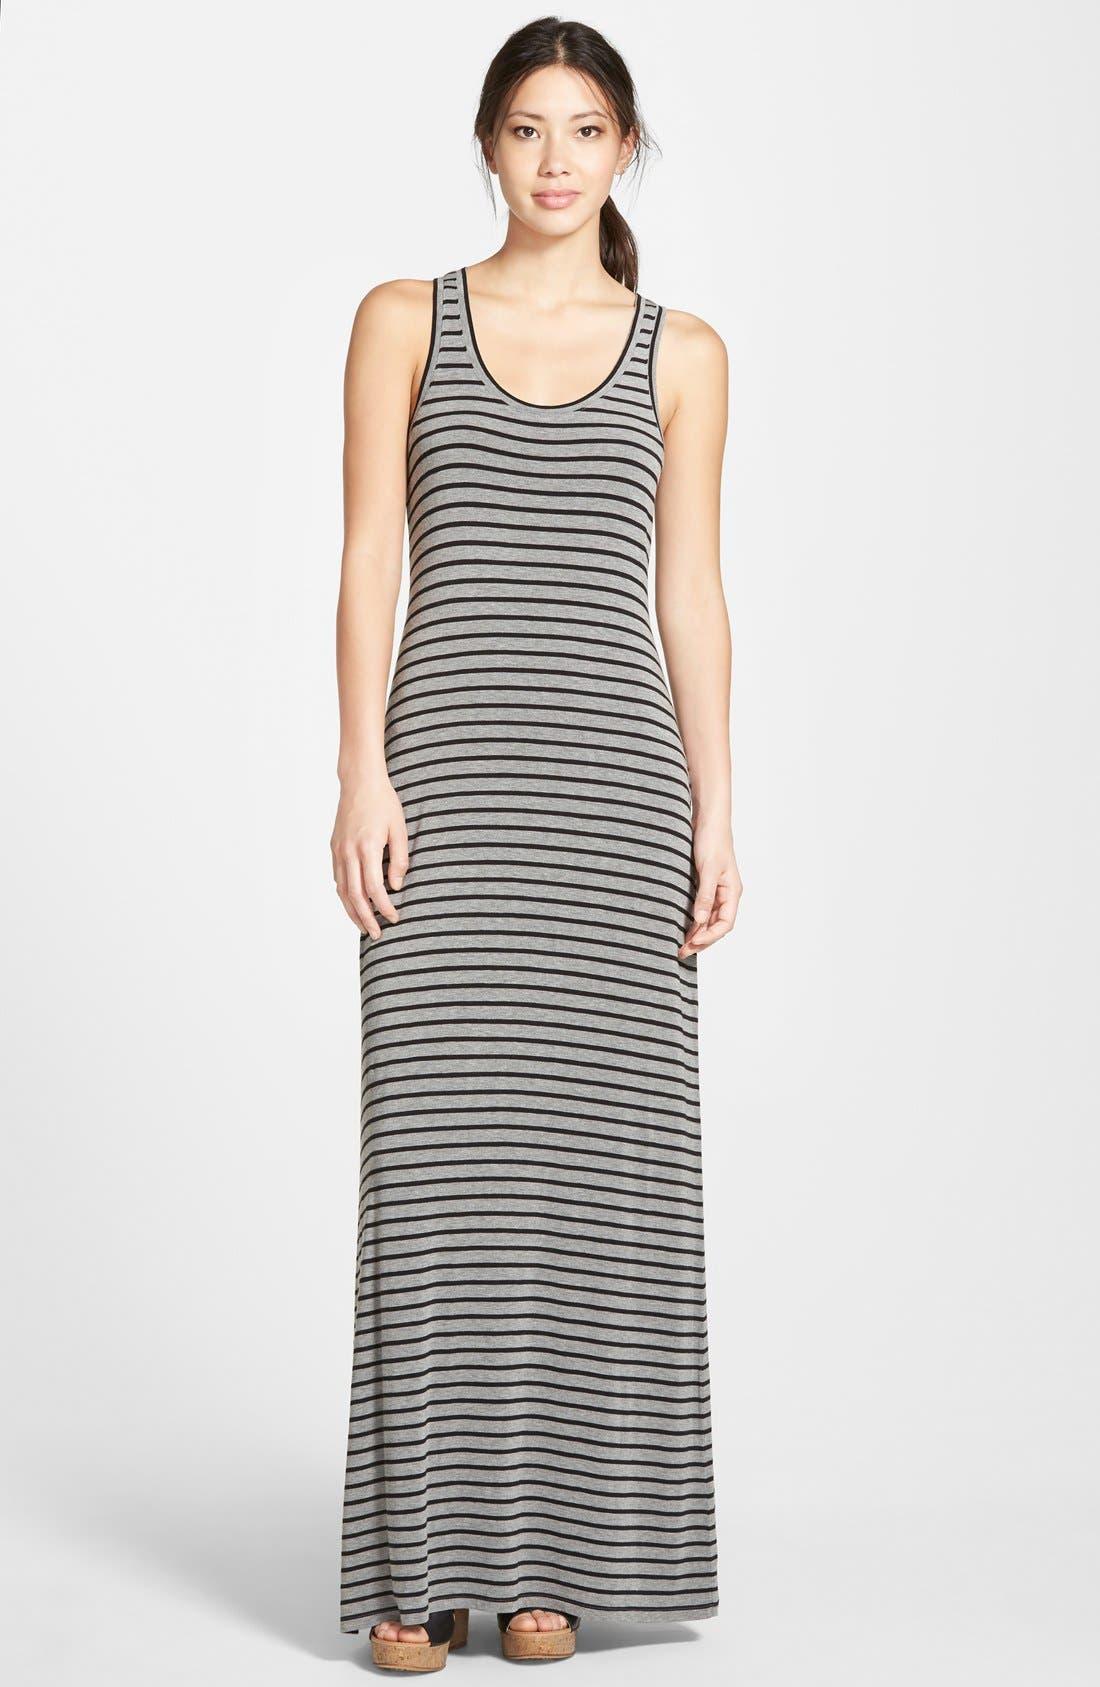 Alternate Image 1 Selected - Caslon® Racerback Maxi Tank Dress (Regular & Petite)